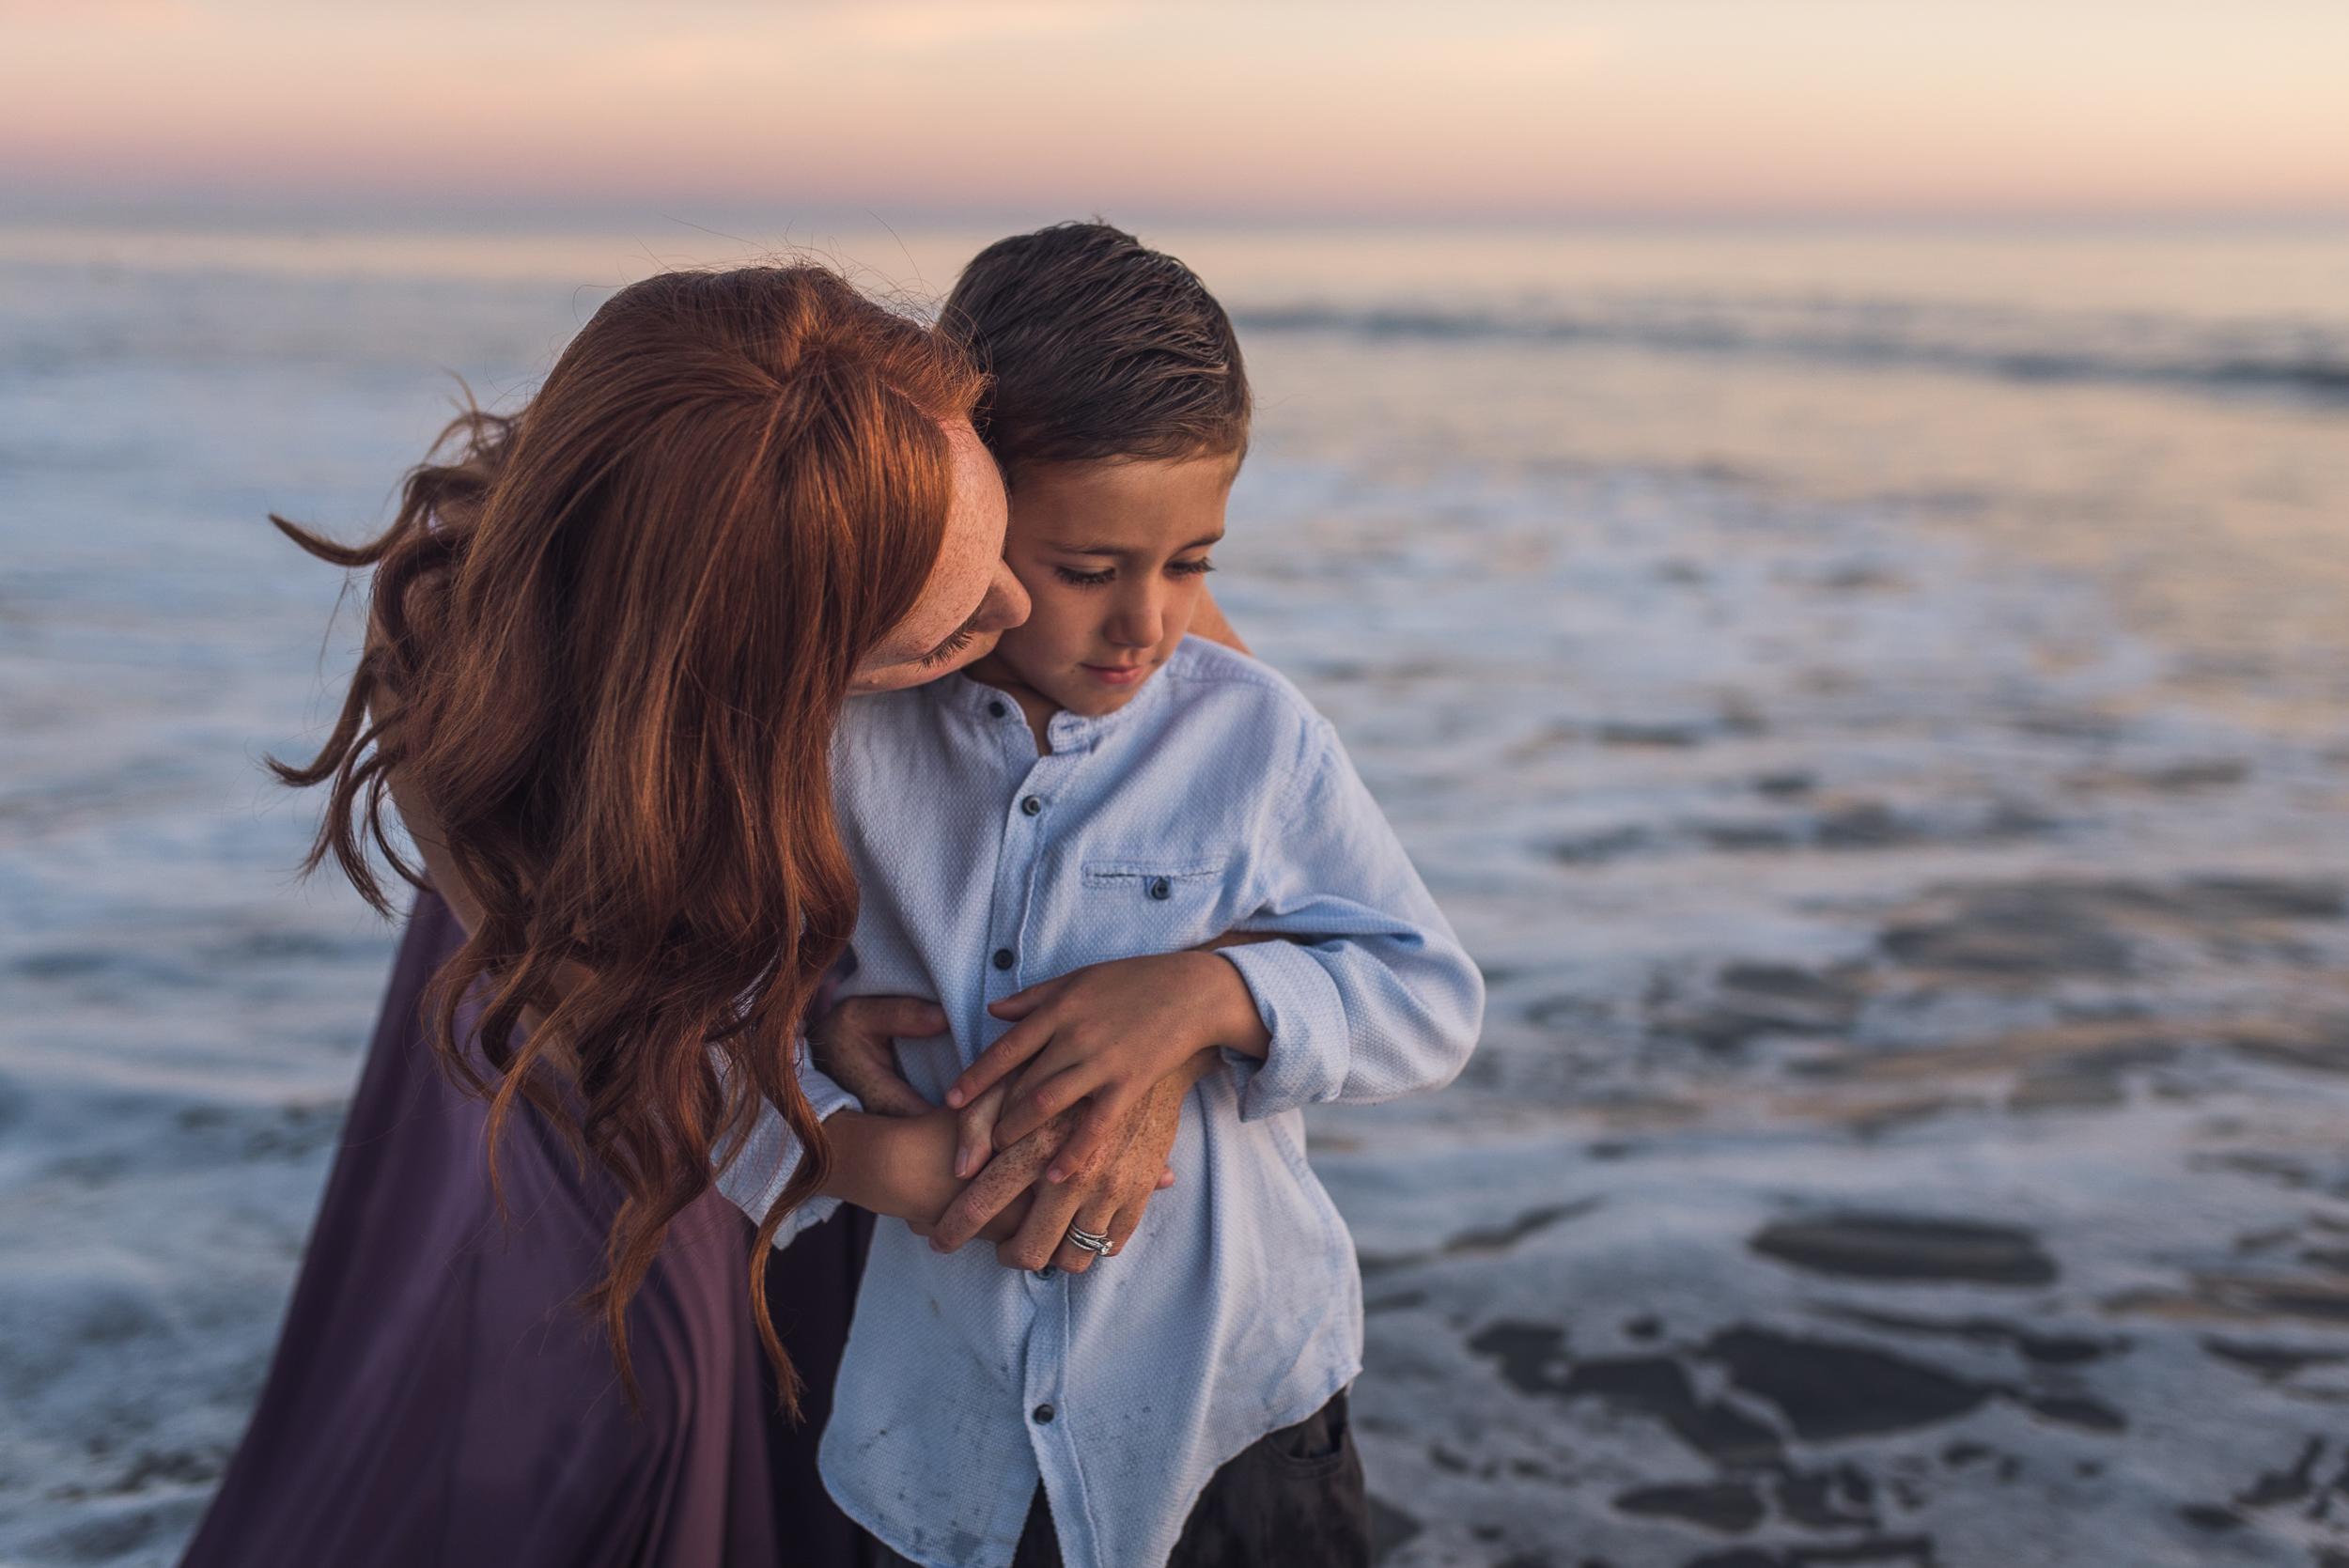 2018-San-Diego-Family-Lifestyle-Newborn-Travel-Vacation-Photographer-Kelsey-Smith-Photography-Coronado-La-Jolla-Encinitas-Solana-Beach-Del-Mar-198.jpg